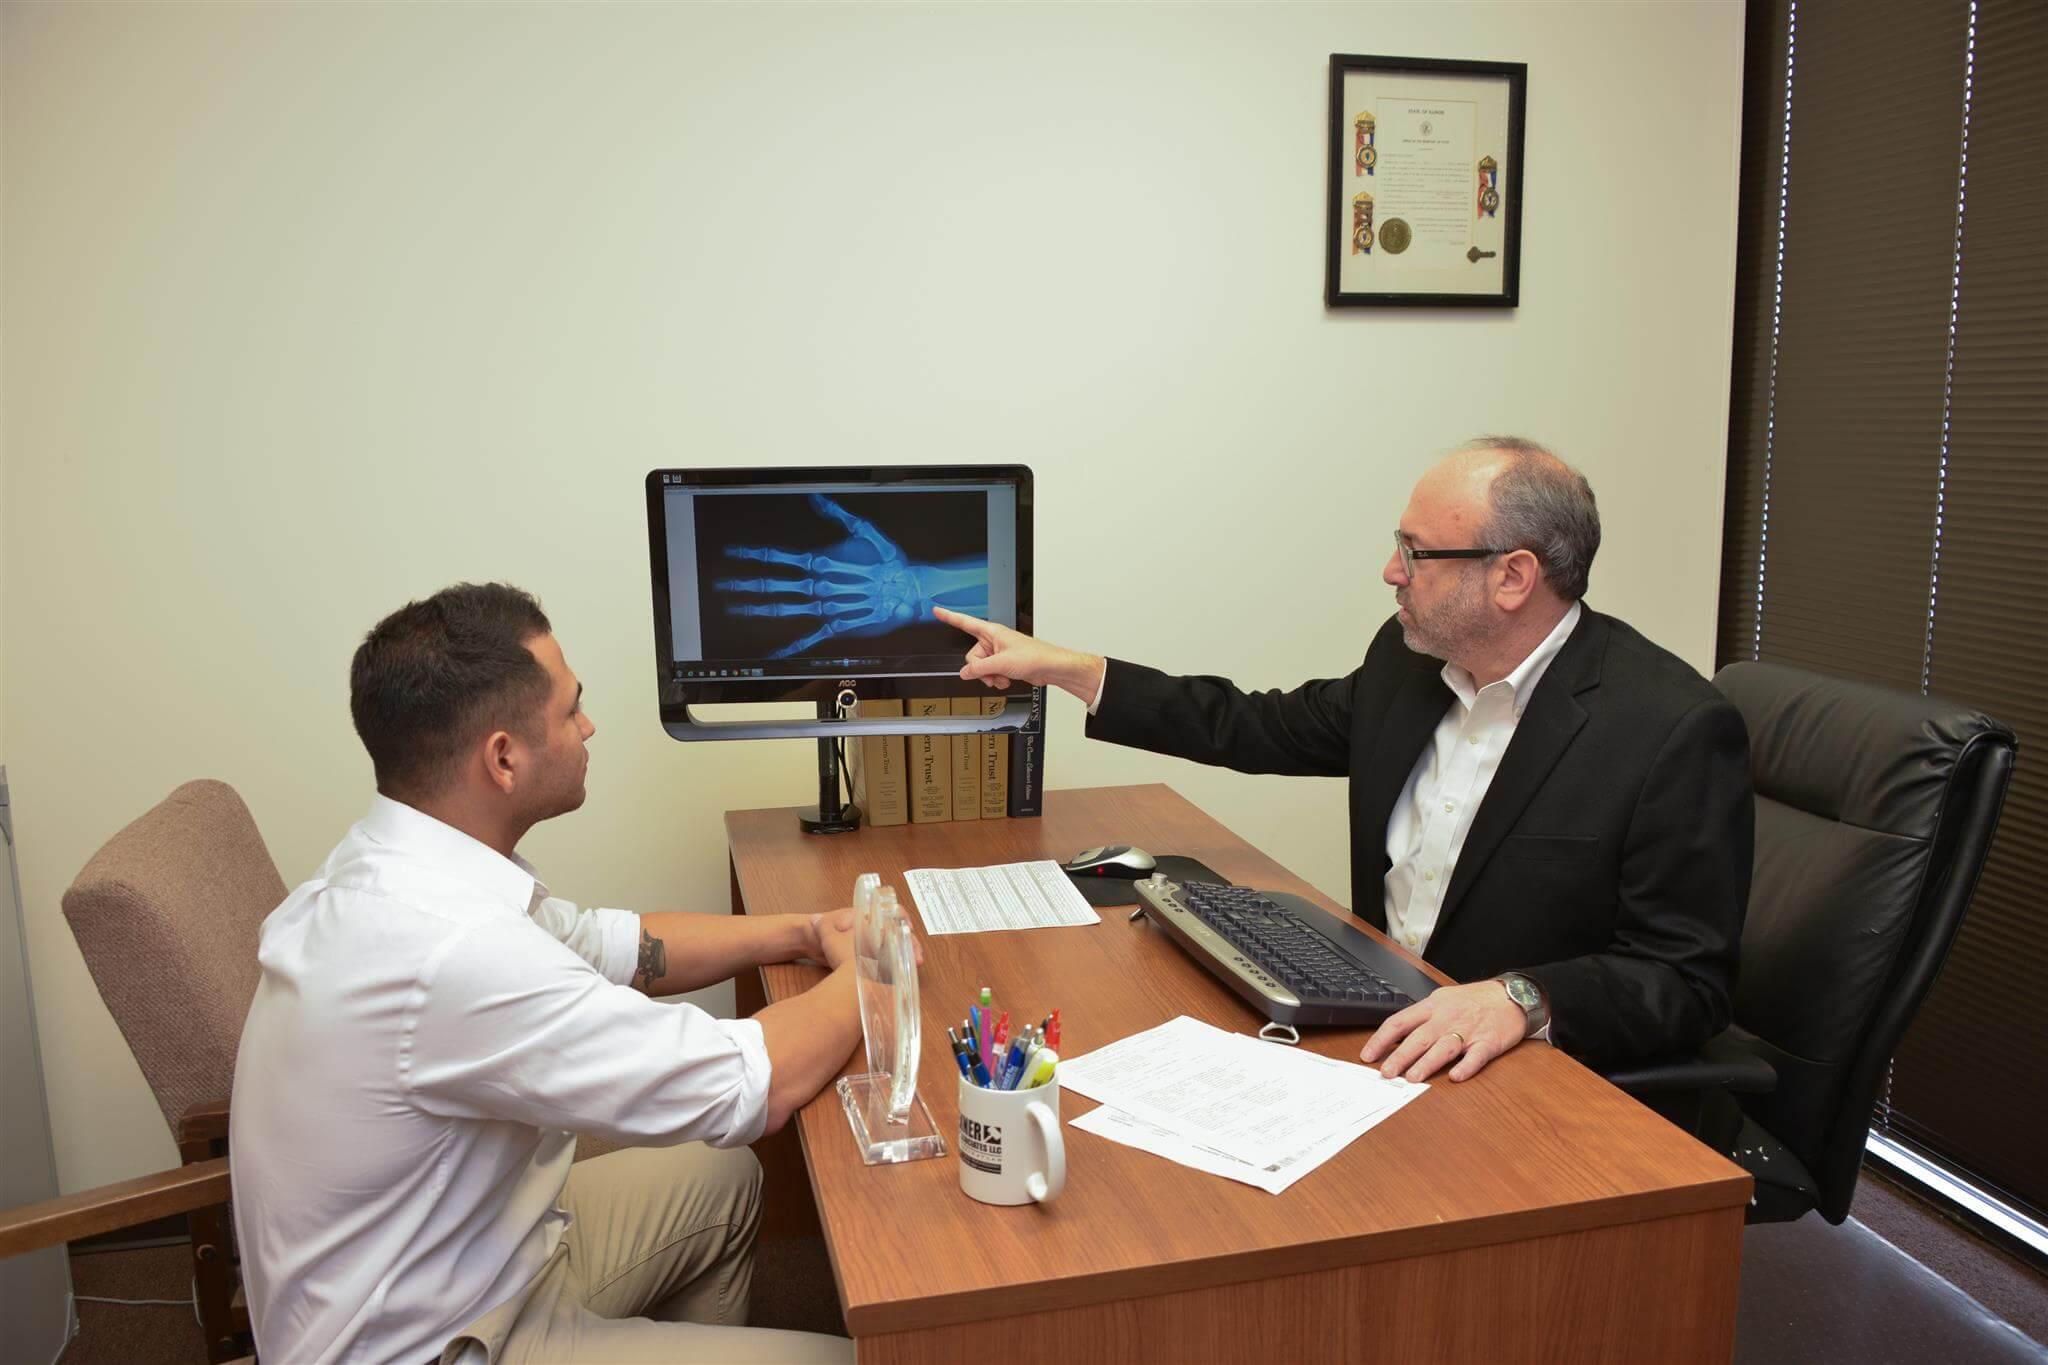 Doctor Explaining Broken write Xray